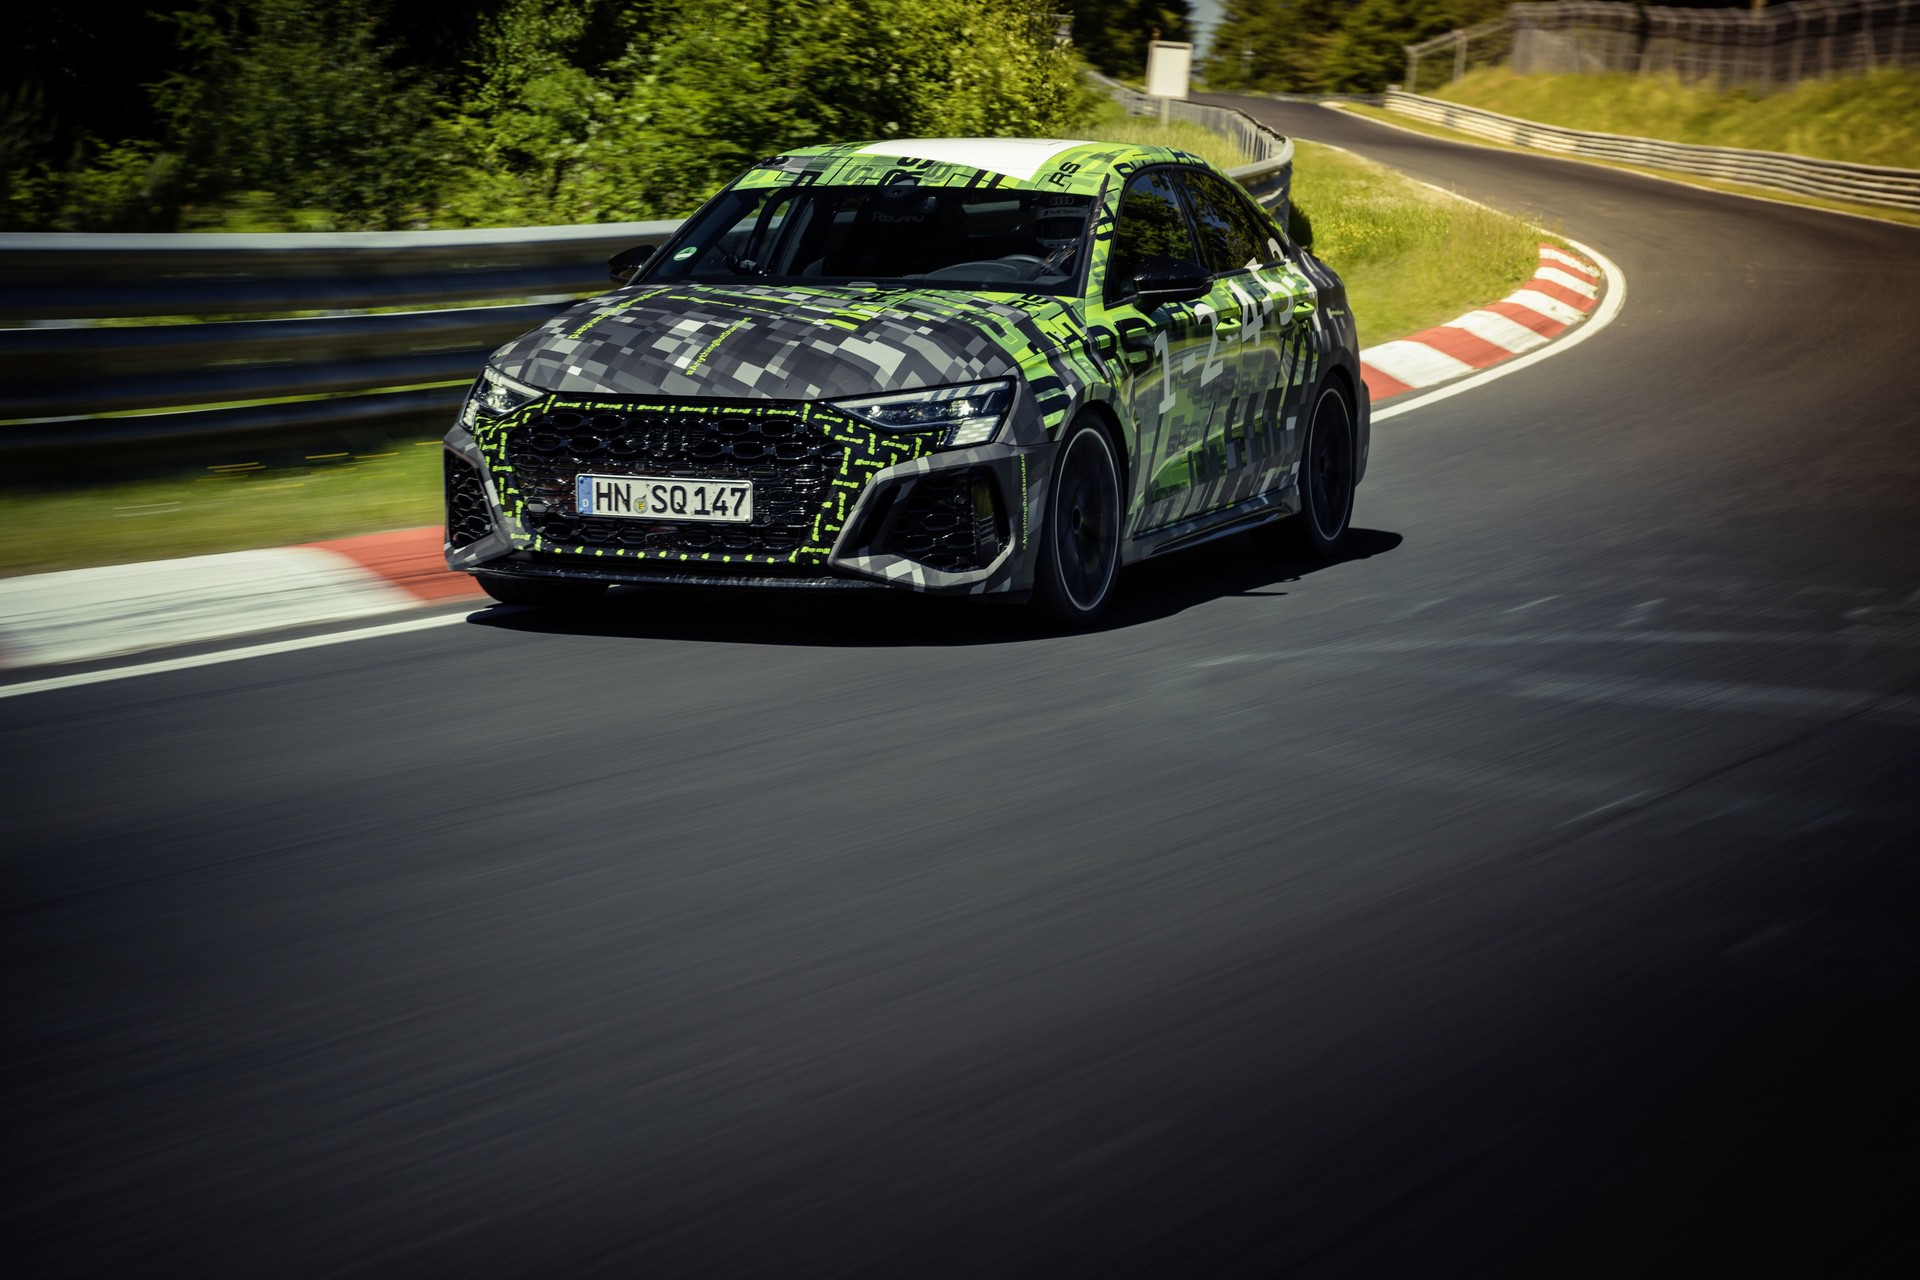 Audi_RS3_Sedan_Nurburgring_lap_record-0015